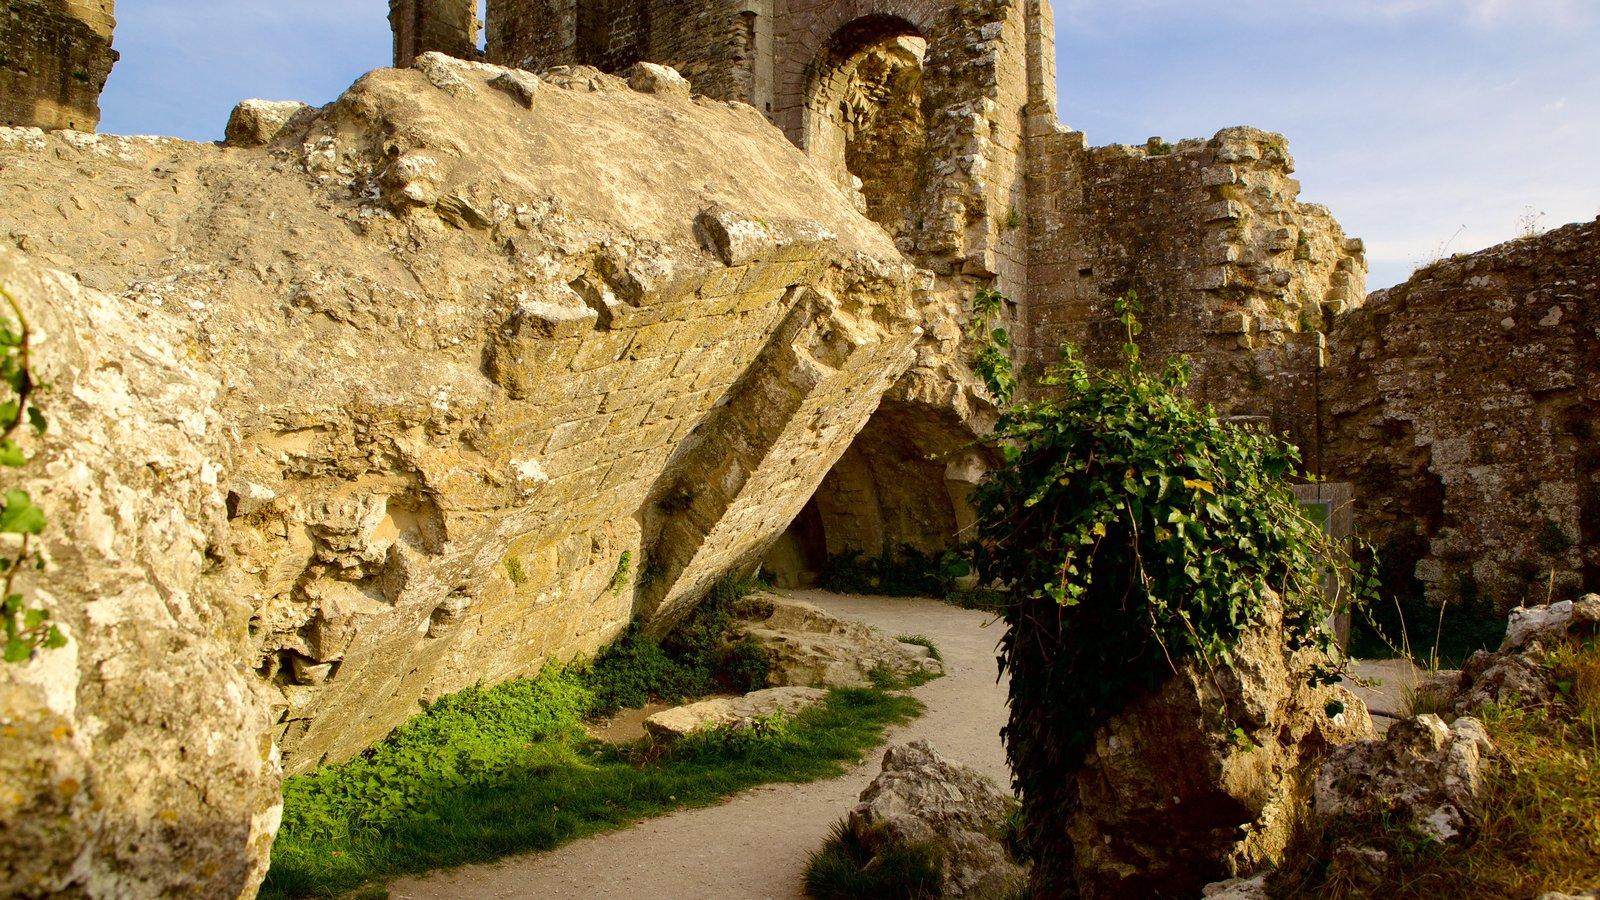 Corfe Castle caracterizando elementos de patrimônio e uma ruína